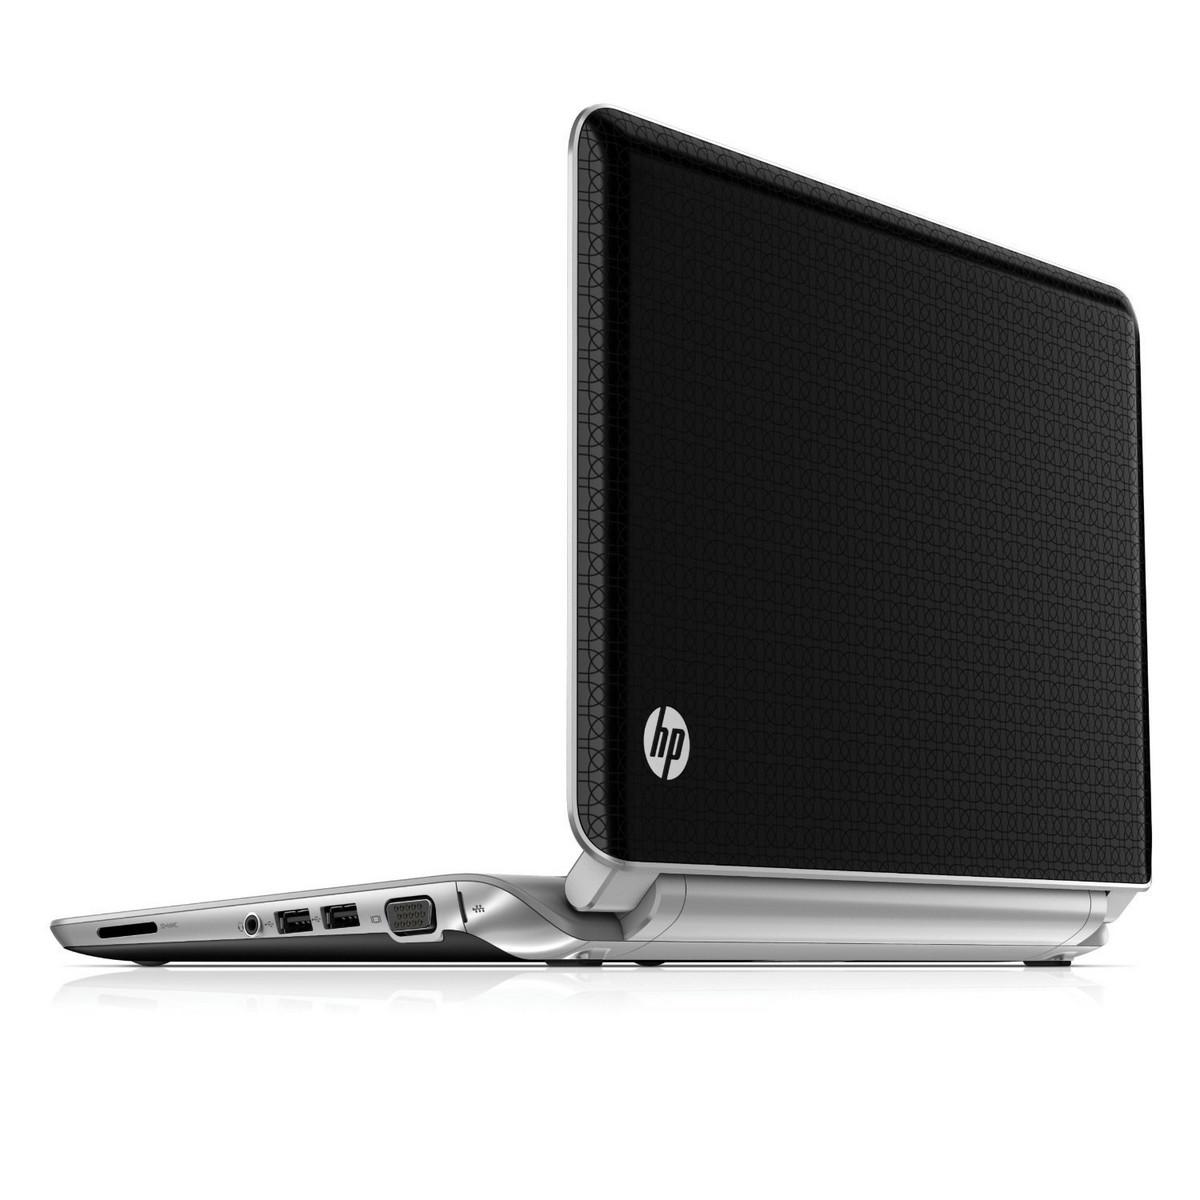 HP Pavilion dm1-3200sa - Notebookcheck.net External Reviews